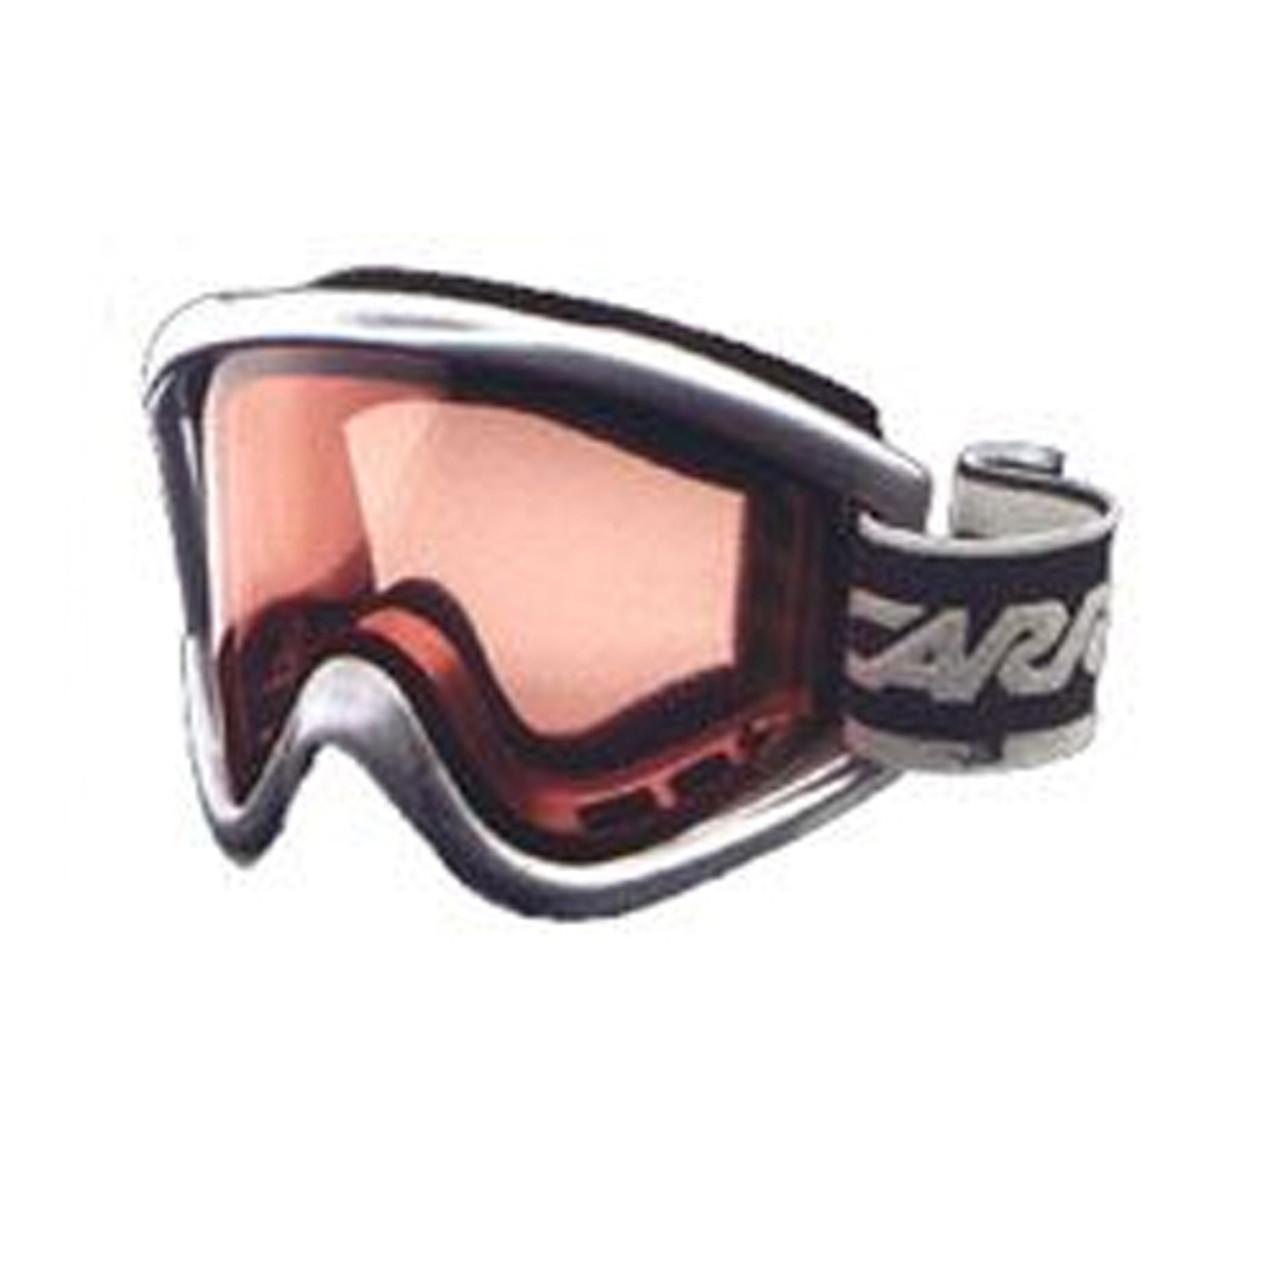 Lens for the Carrera Runaway Ski Goggles